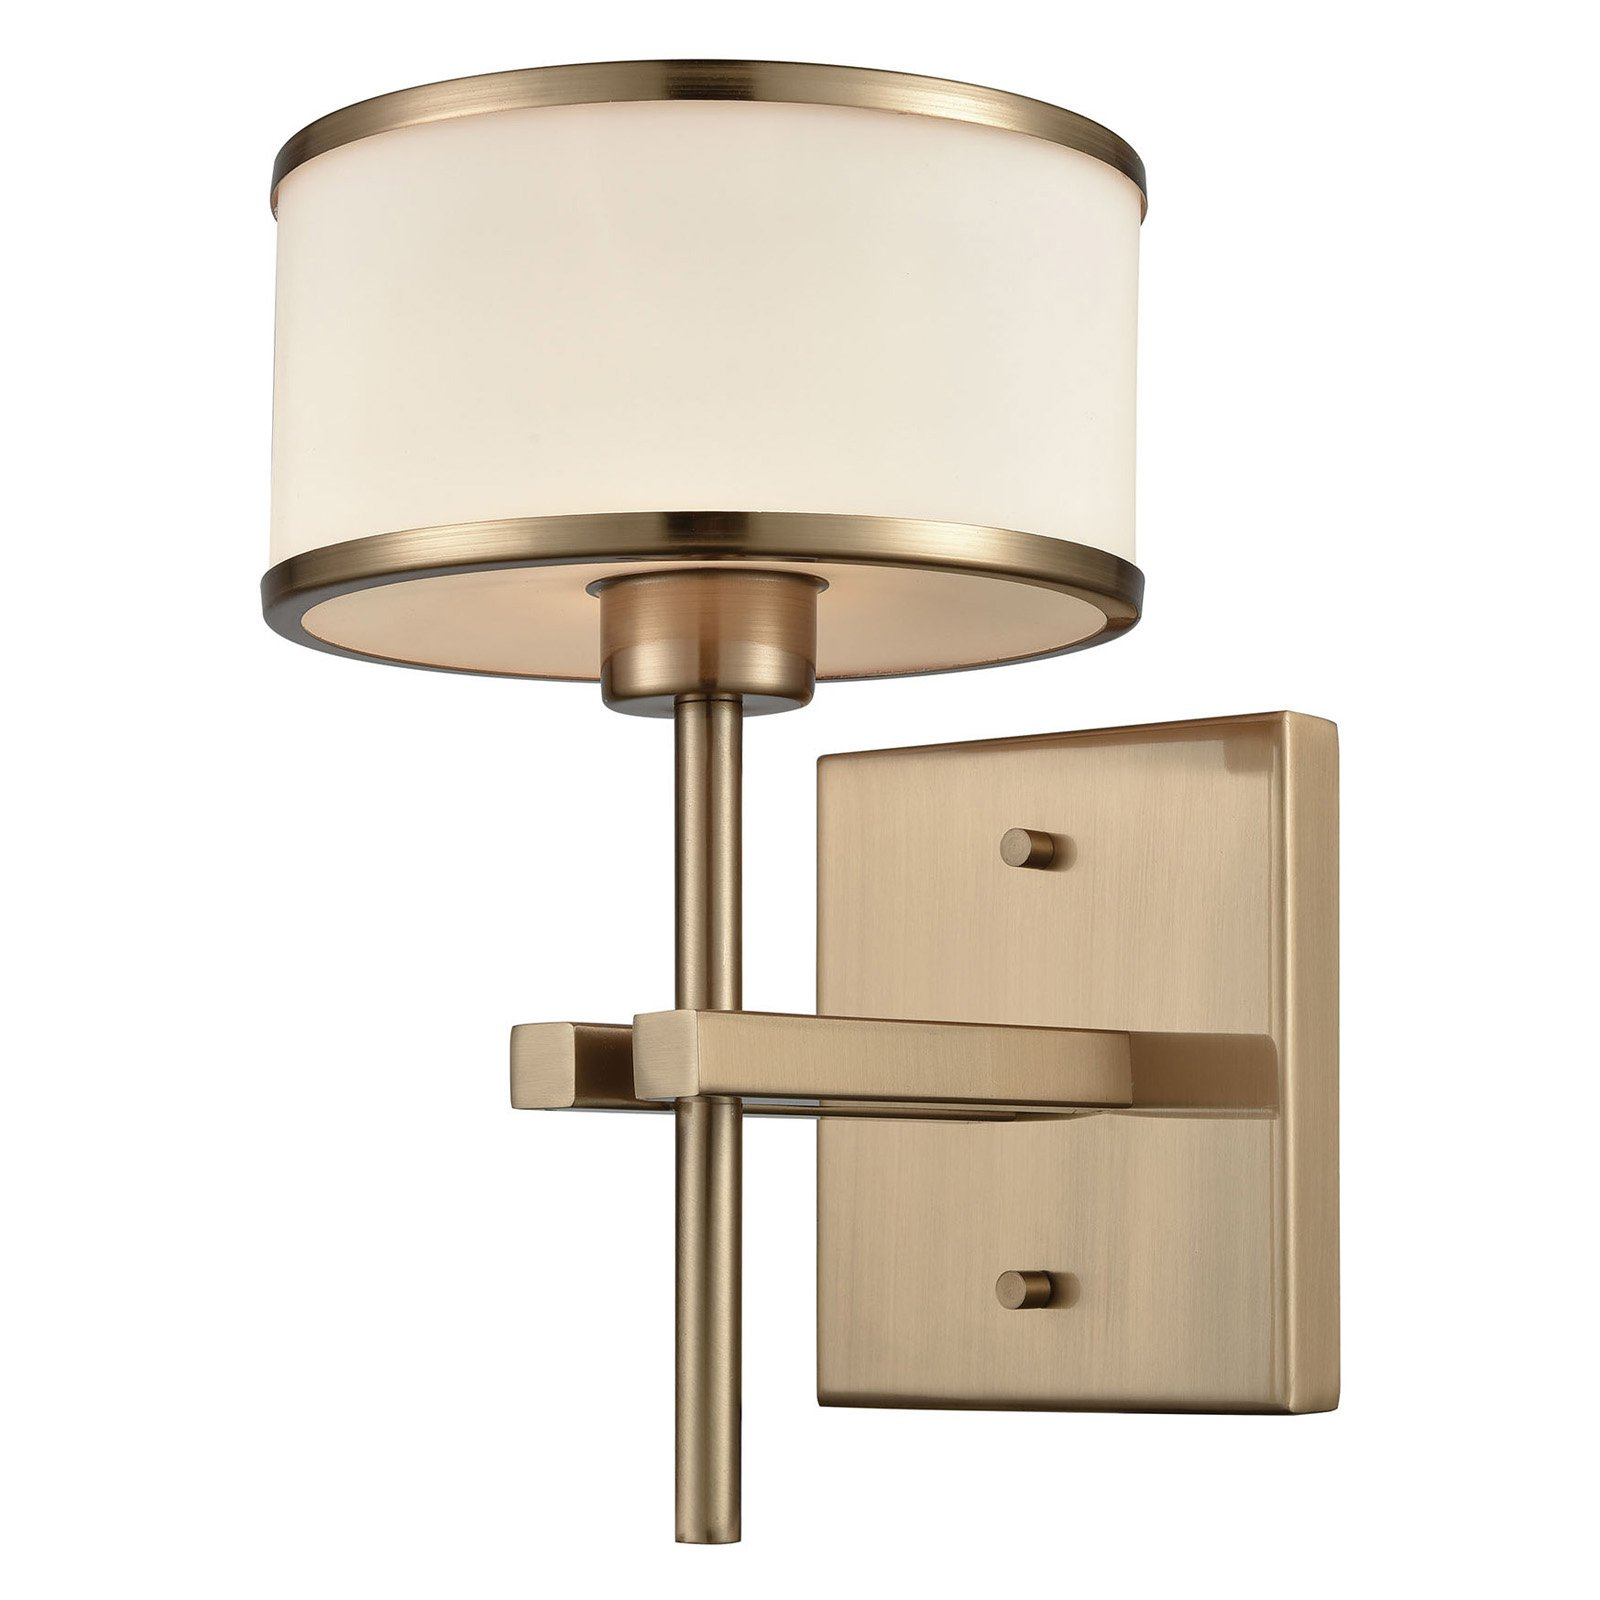 Elk lighting utica 11615 1 bathroom vanity light